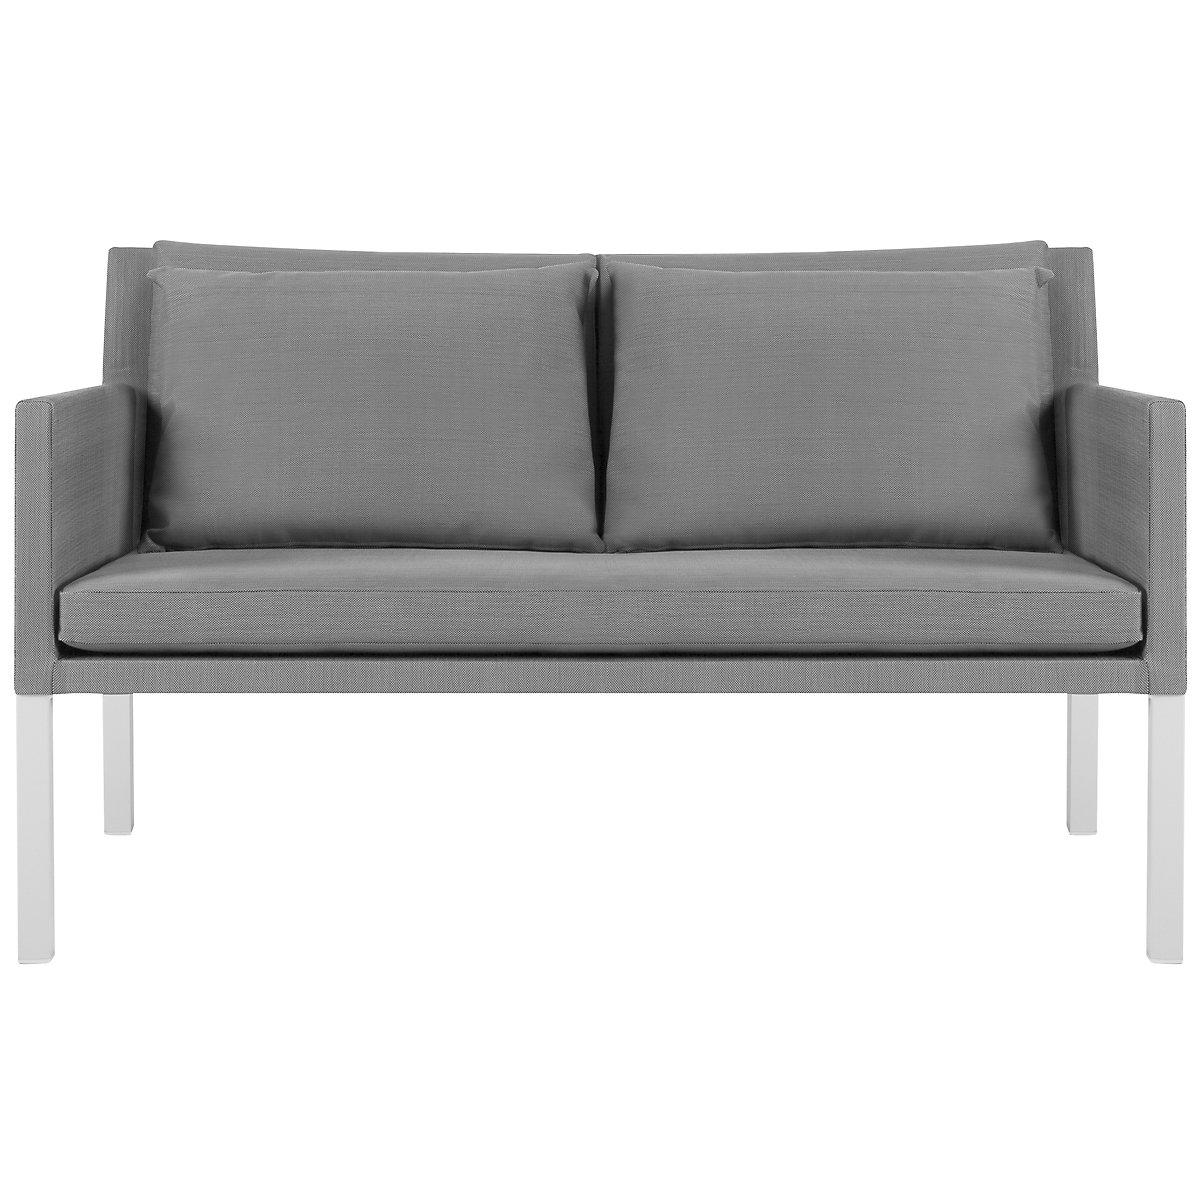 Lisbon gray outdoor living room set